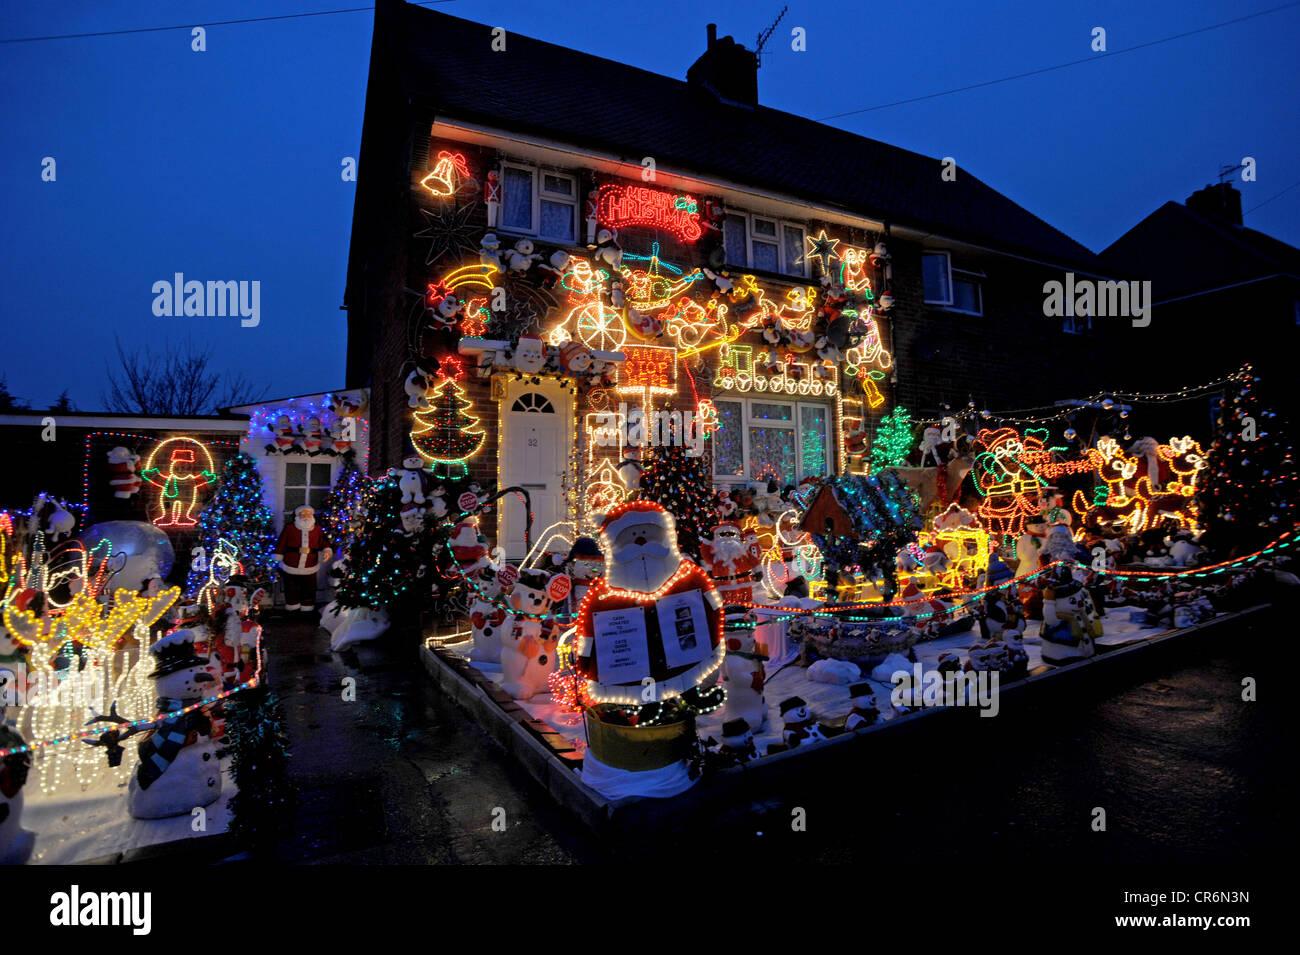 Christmas decorations house outside